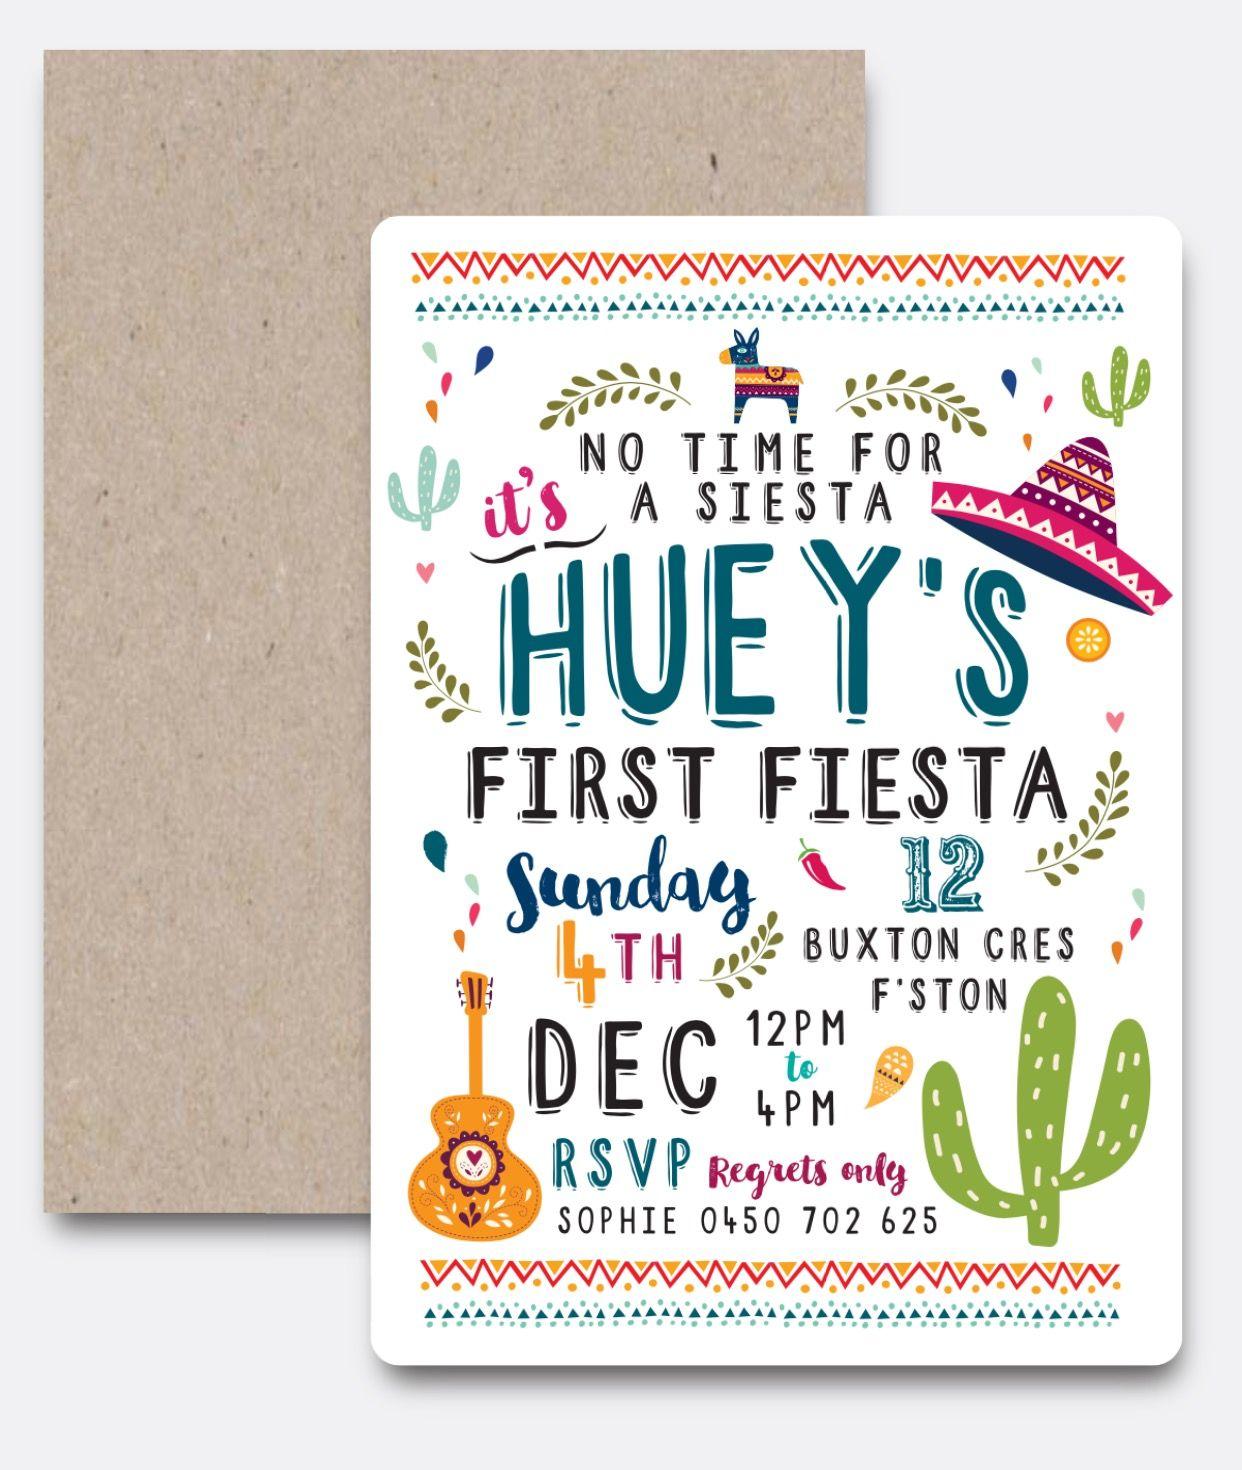 FIESTA Invitation Set   Screenshots   Pinterest   Fiestas, Custom ...